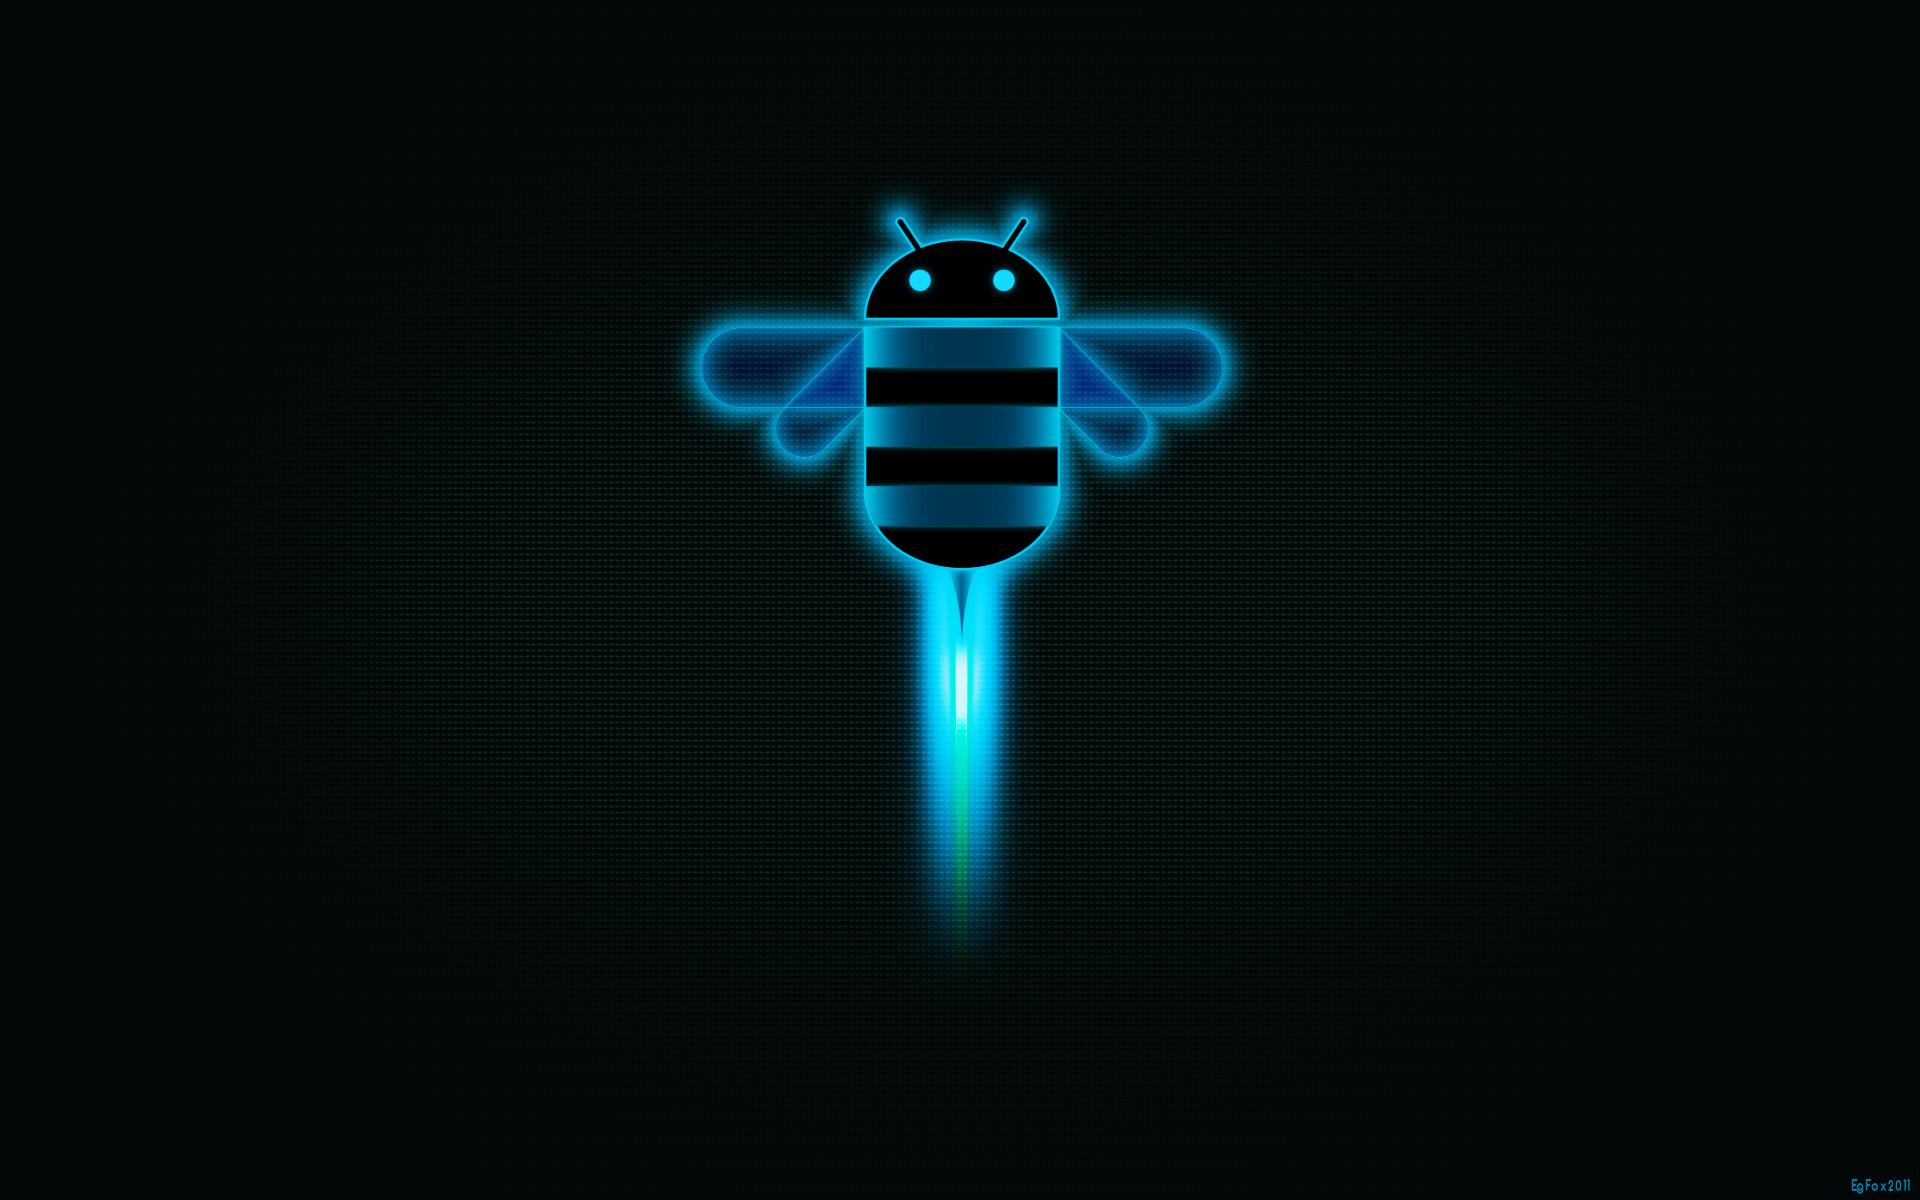 egfox honeycomb hd blue 2 by eg art d390kap Mükemmel HD Resimler